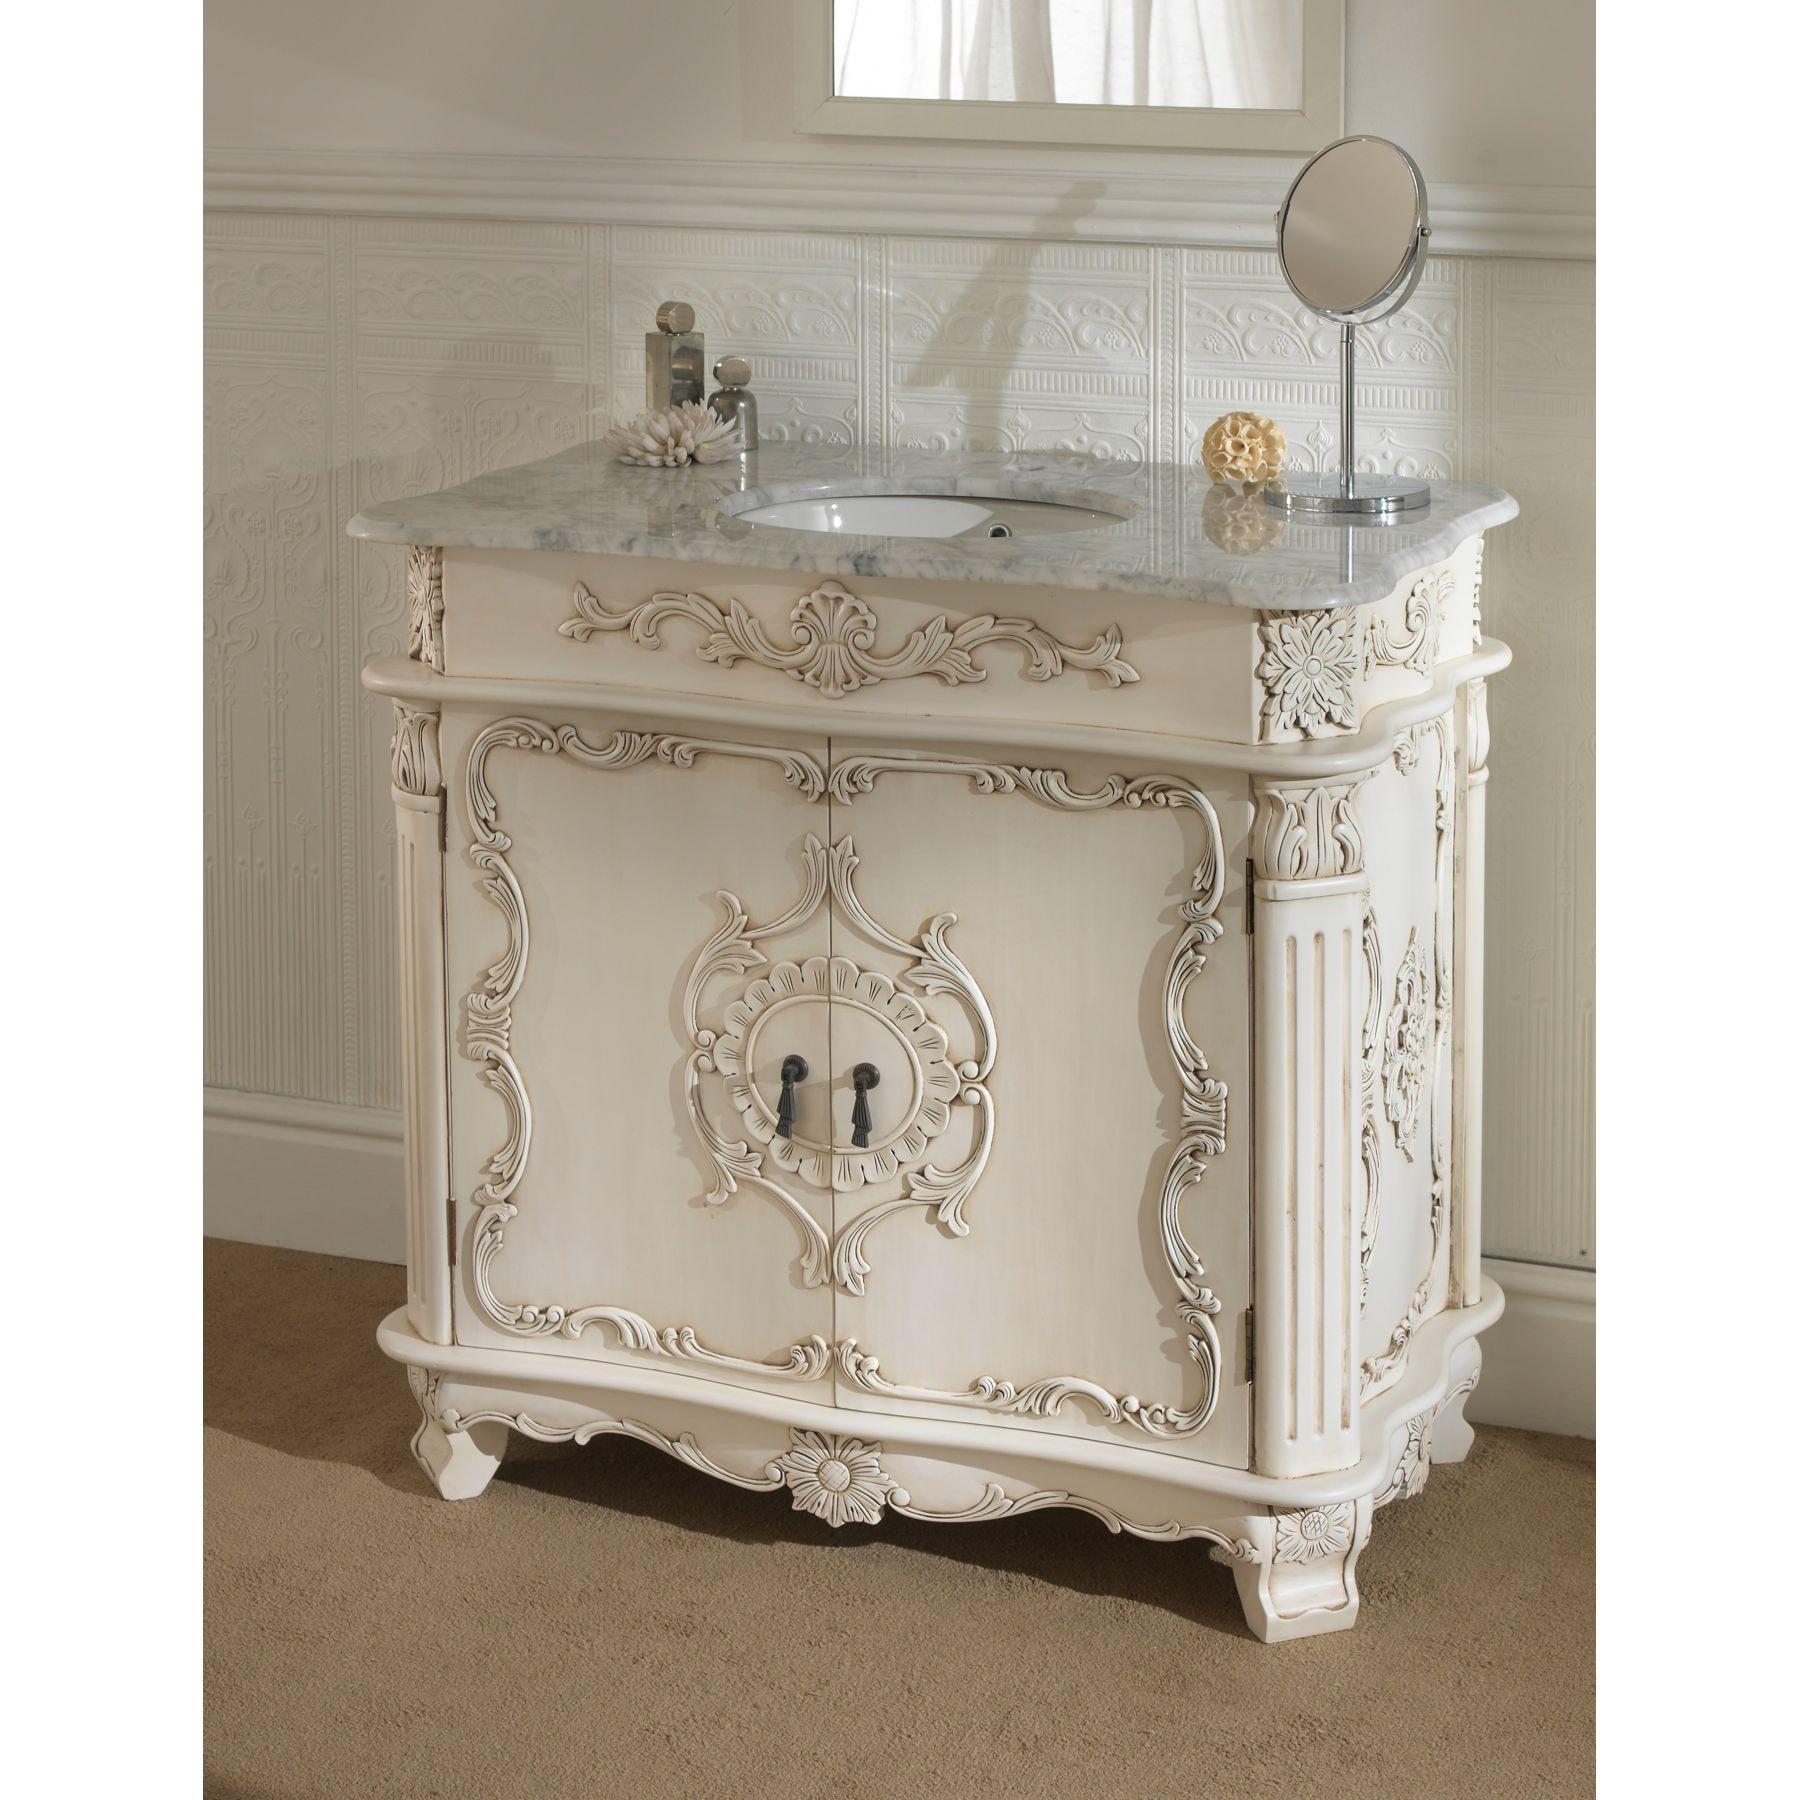 Antique French Vanity Unit